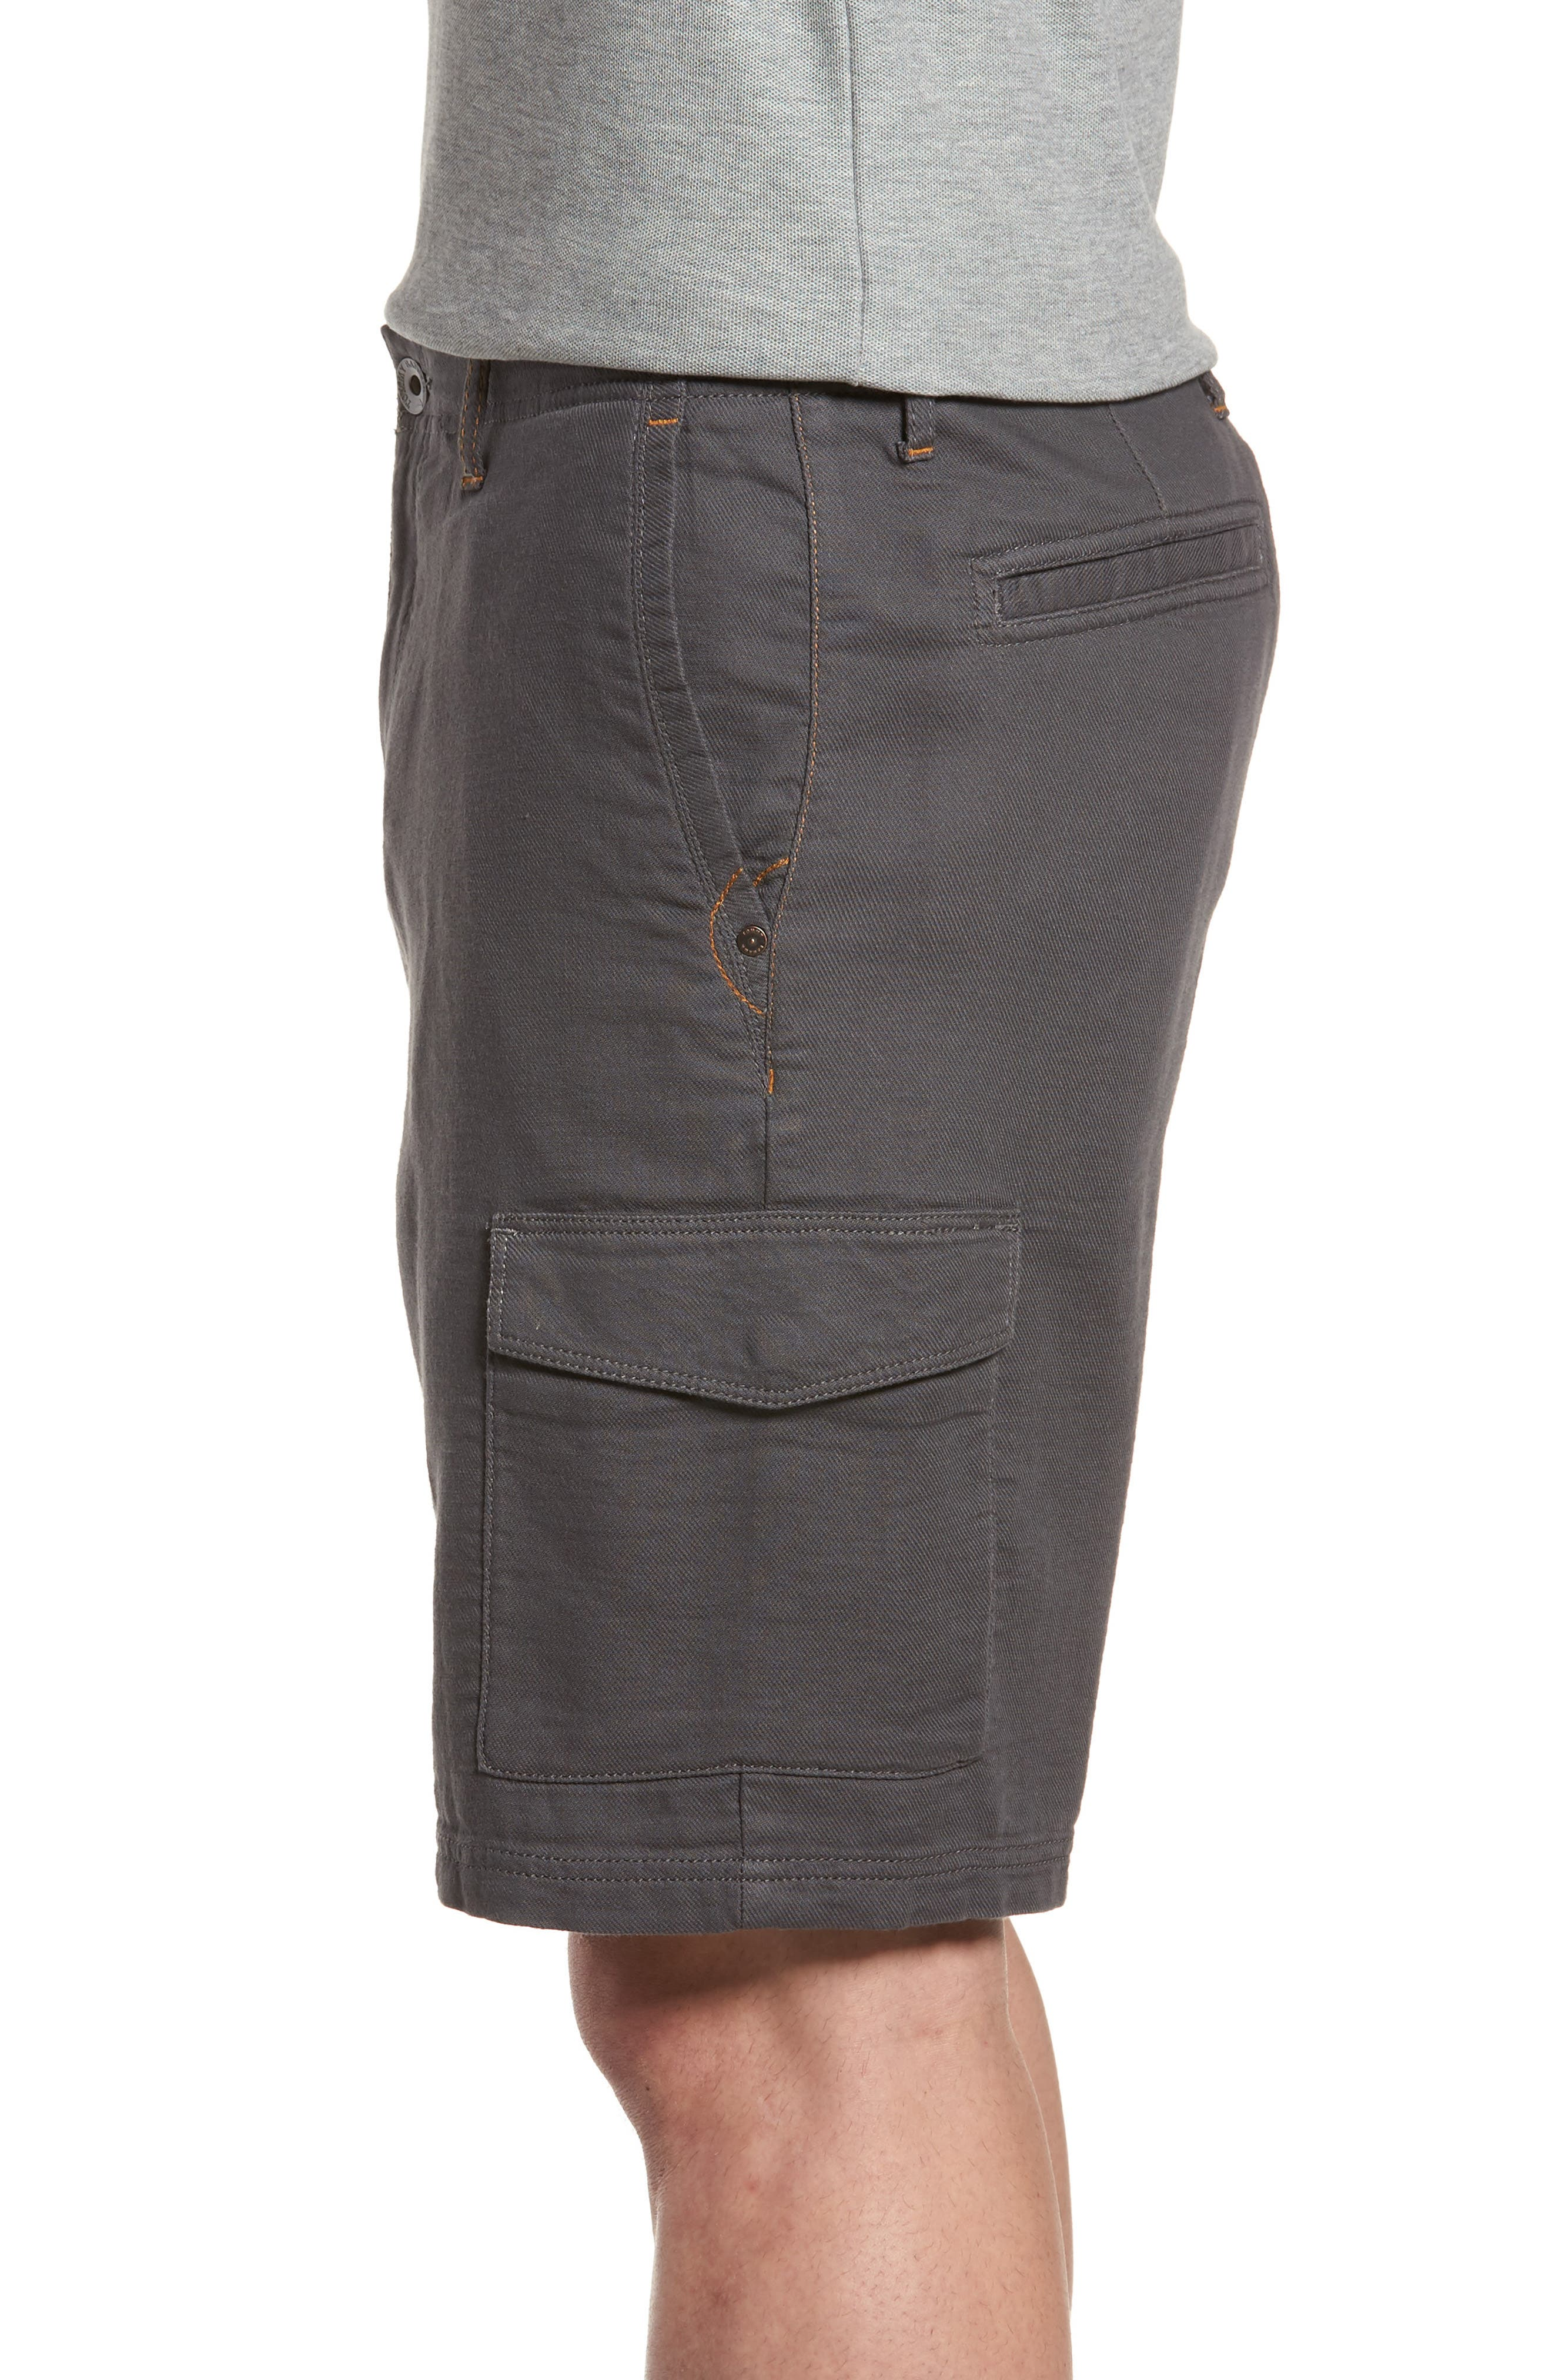 Edgewood Cargo Shorts,                             Alternate thumbnail 4, color,                             050